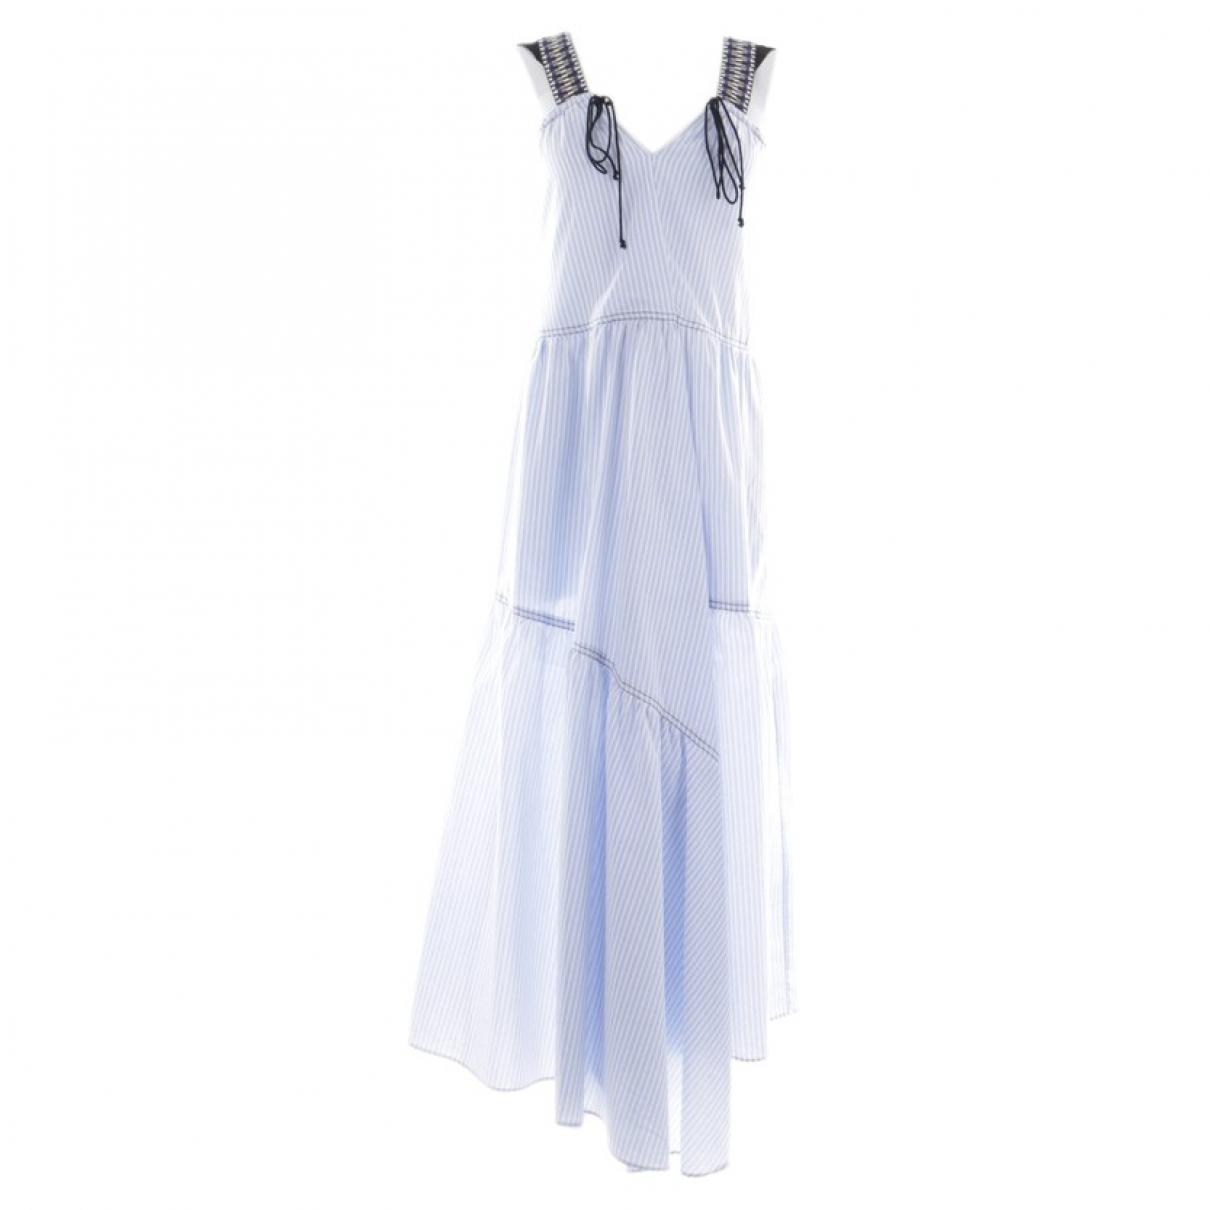 Dorothee Schumacher \N Blue Cotton dress for Women 36 FR